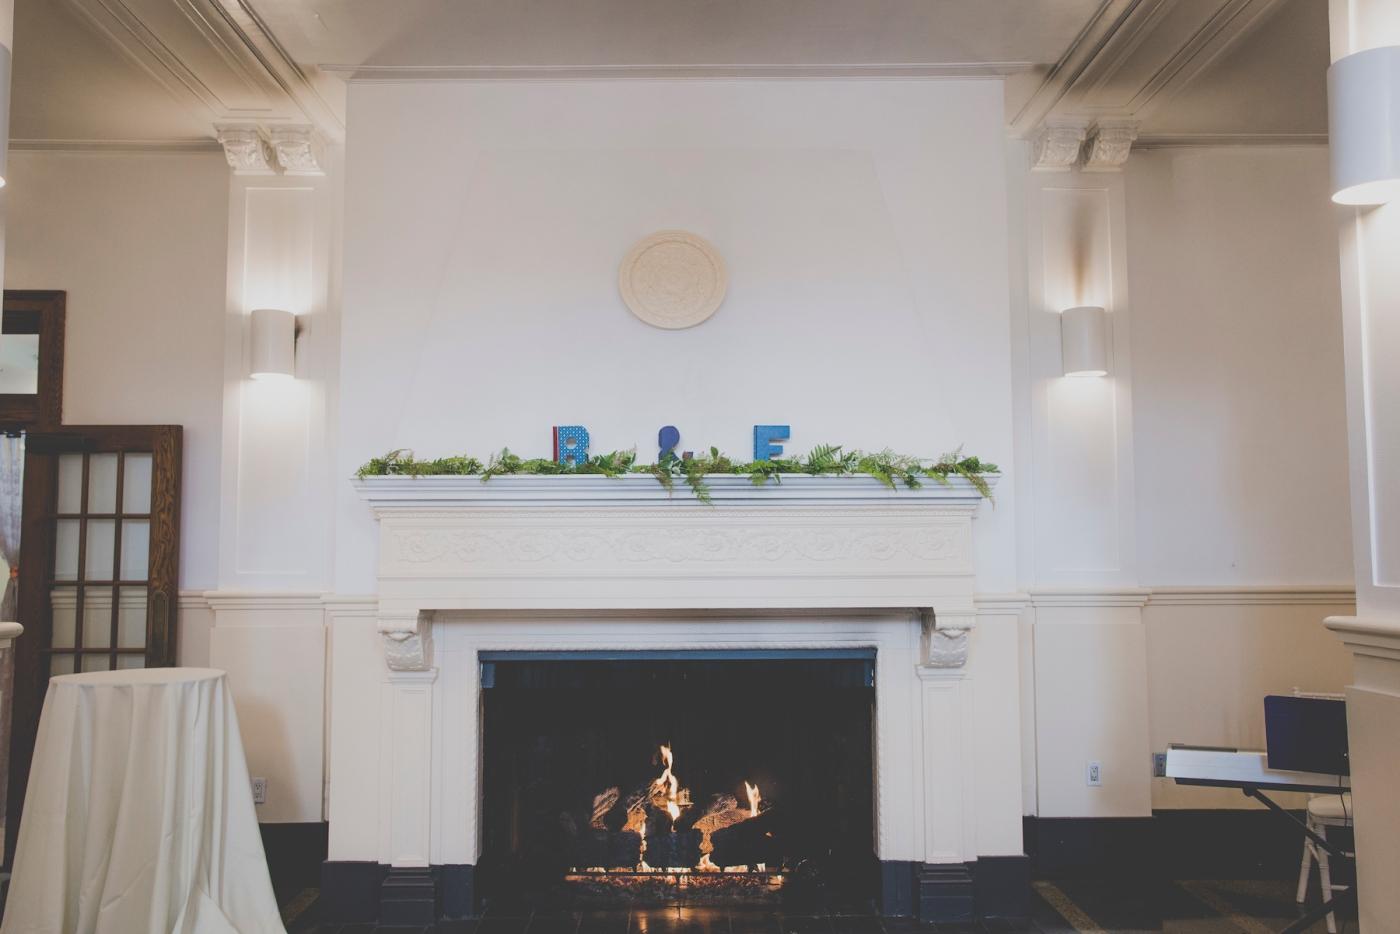 DSC_2101Everett_Wedding_Ballroom_Jane_Speleers_photography_Rachel_and_Edmund_Details_2017